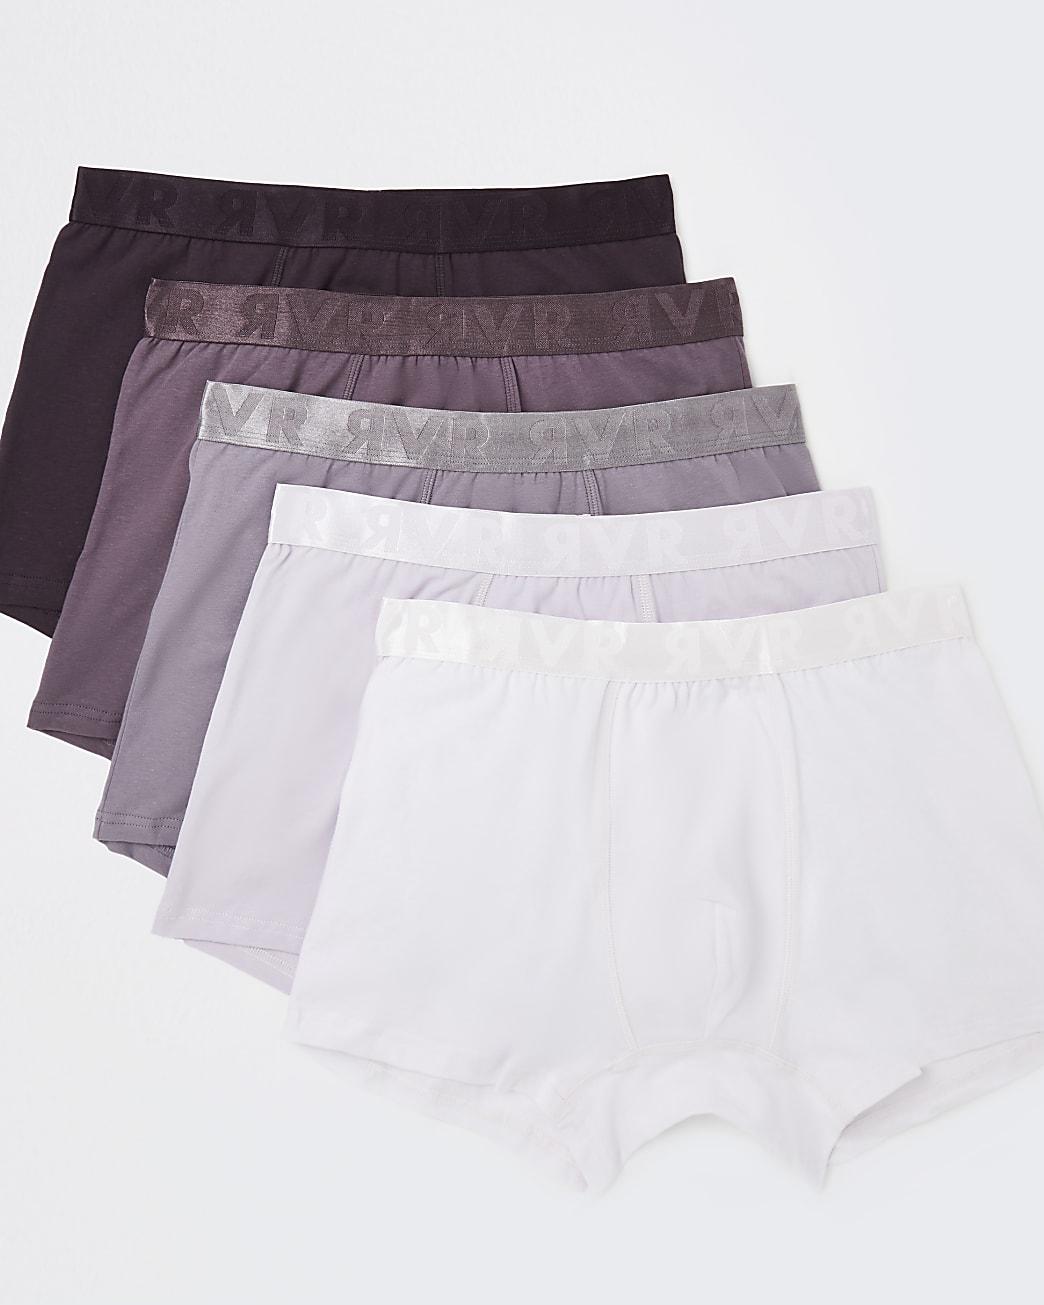 Purple RI branded trunks 5 pack